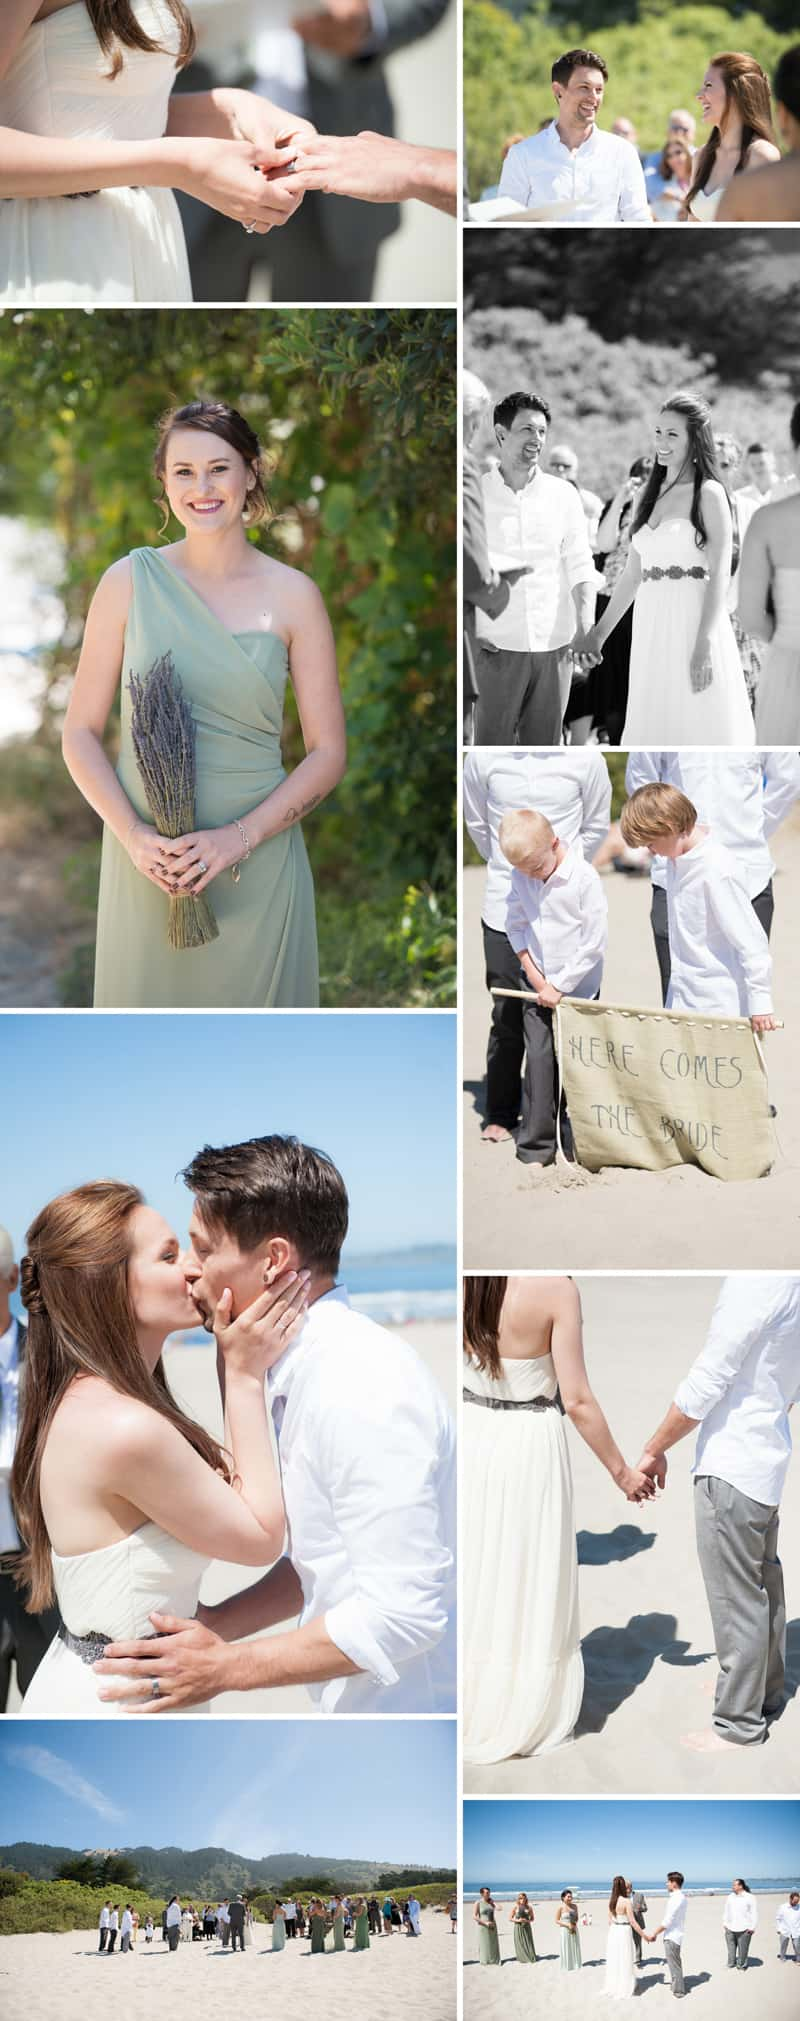 An Intimate Rustic Beach Wedding 2